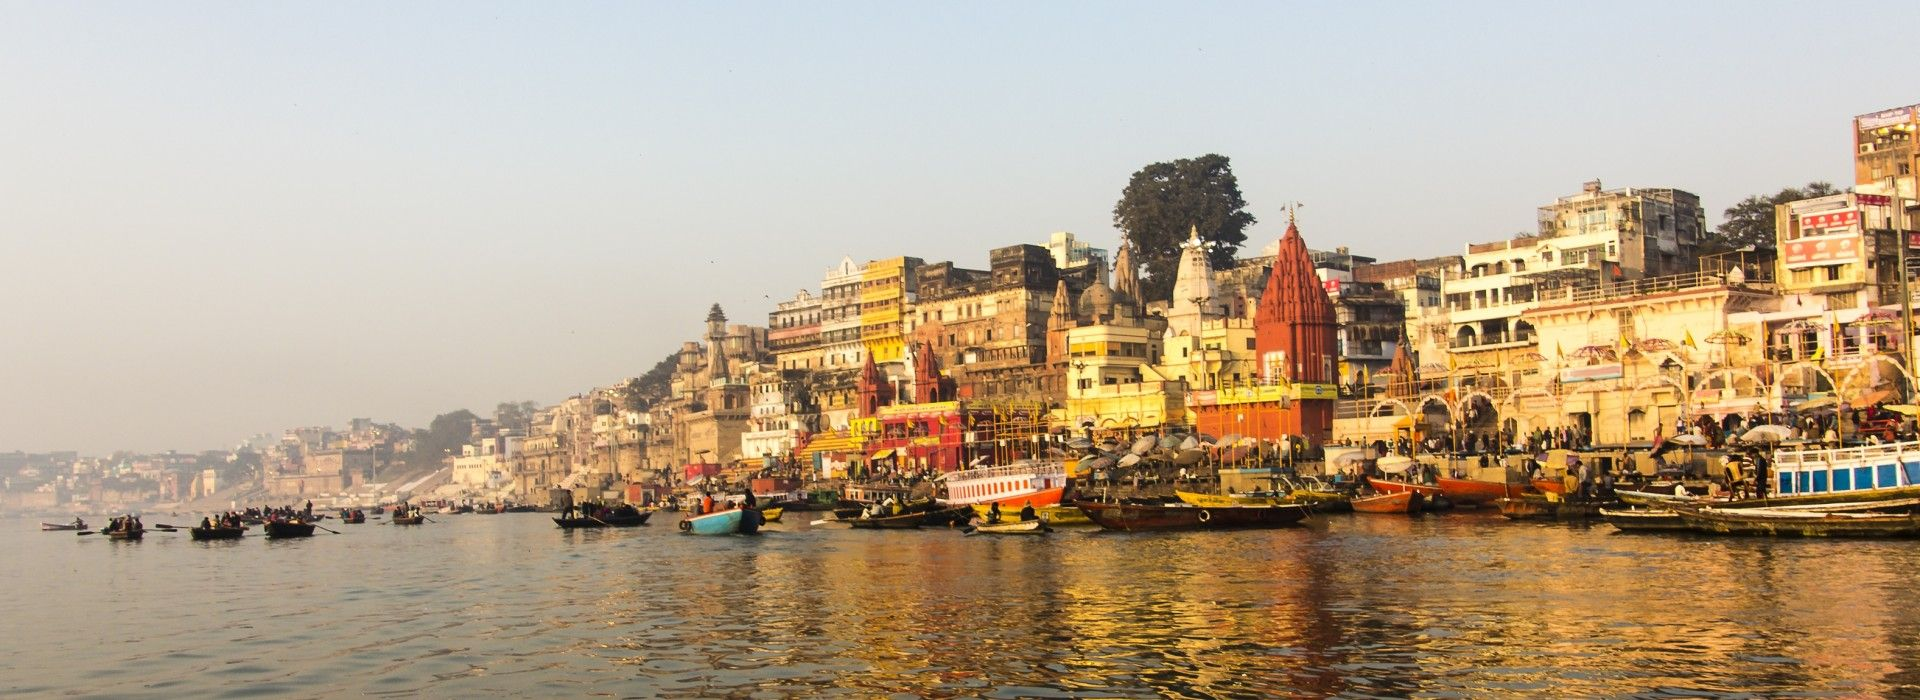 Varanasi tours and trips to Varanasi